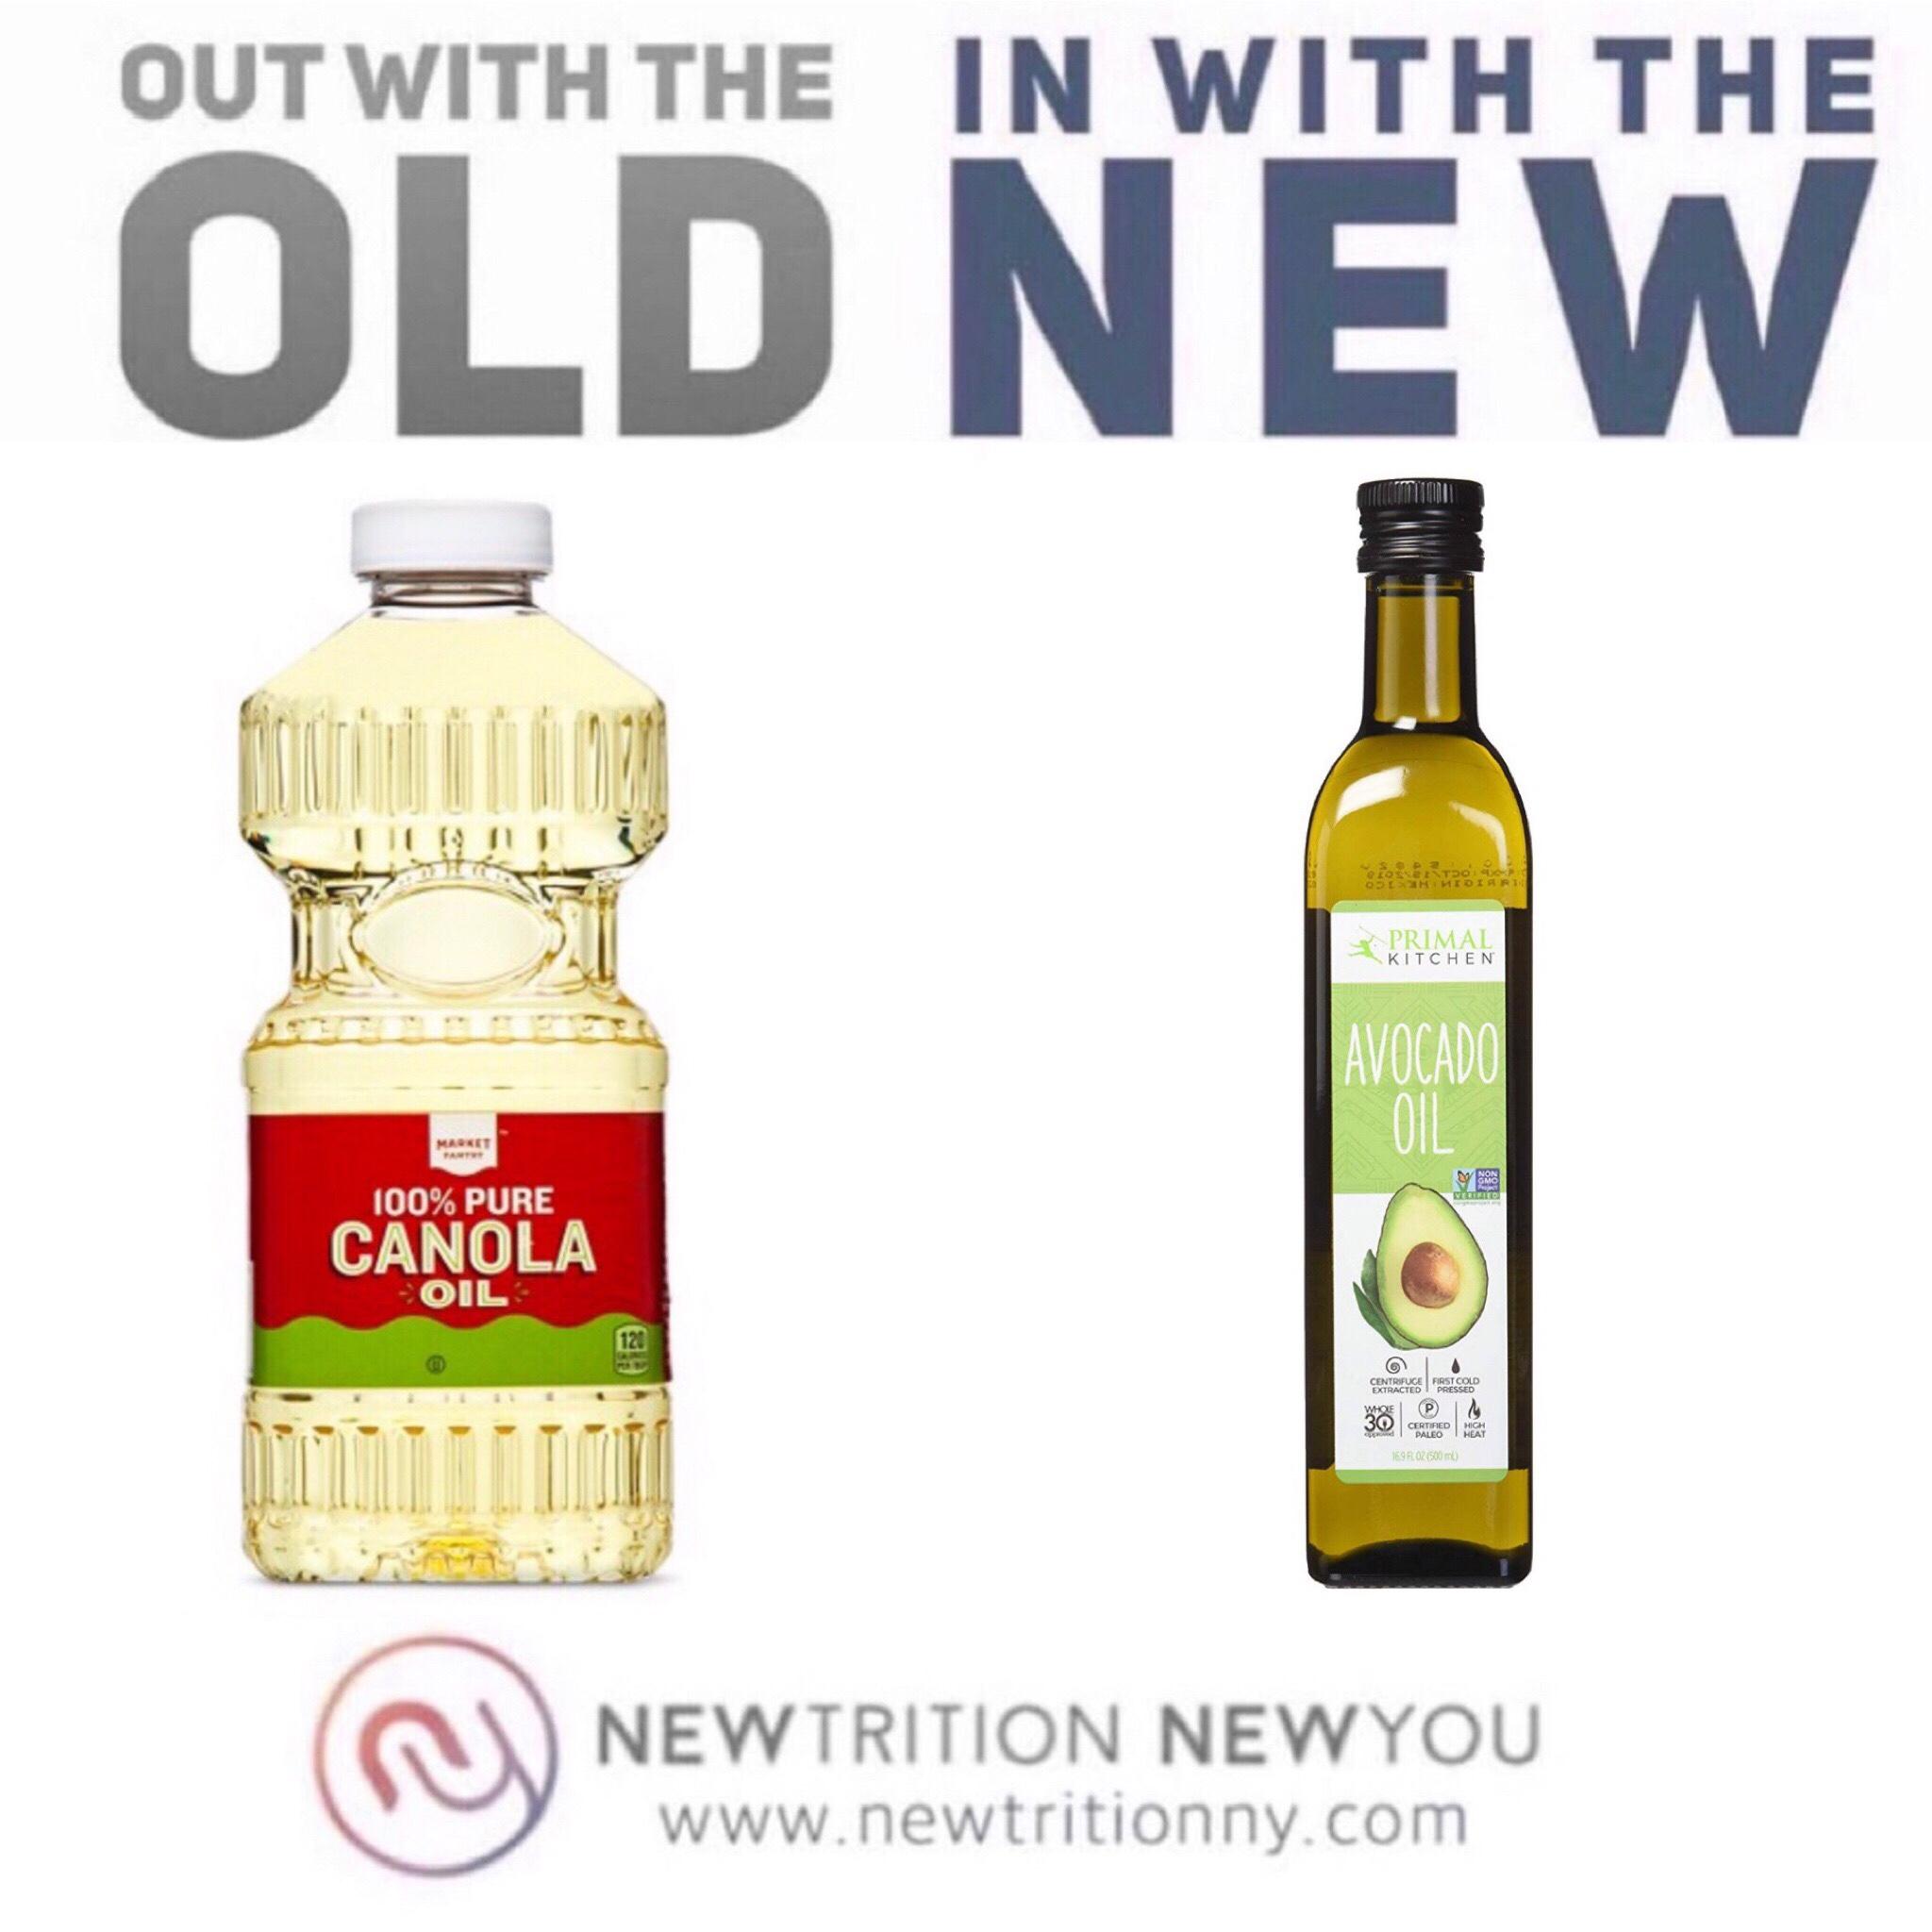 Clean Swap - Vegetable Oil Canola Oil to Avocado Oil